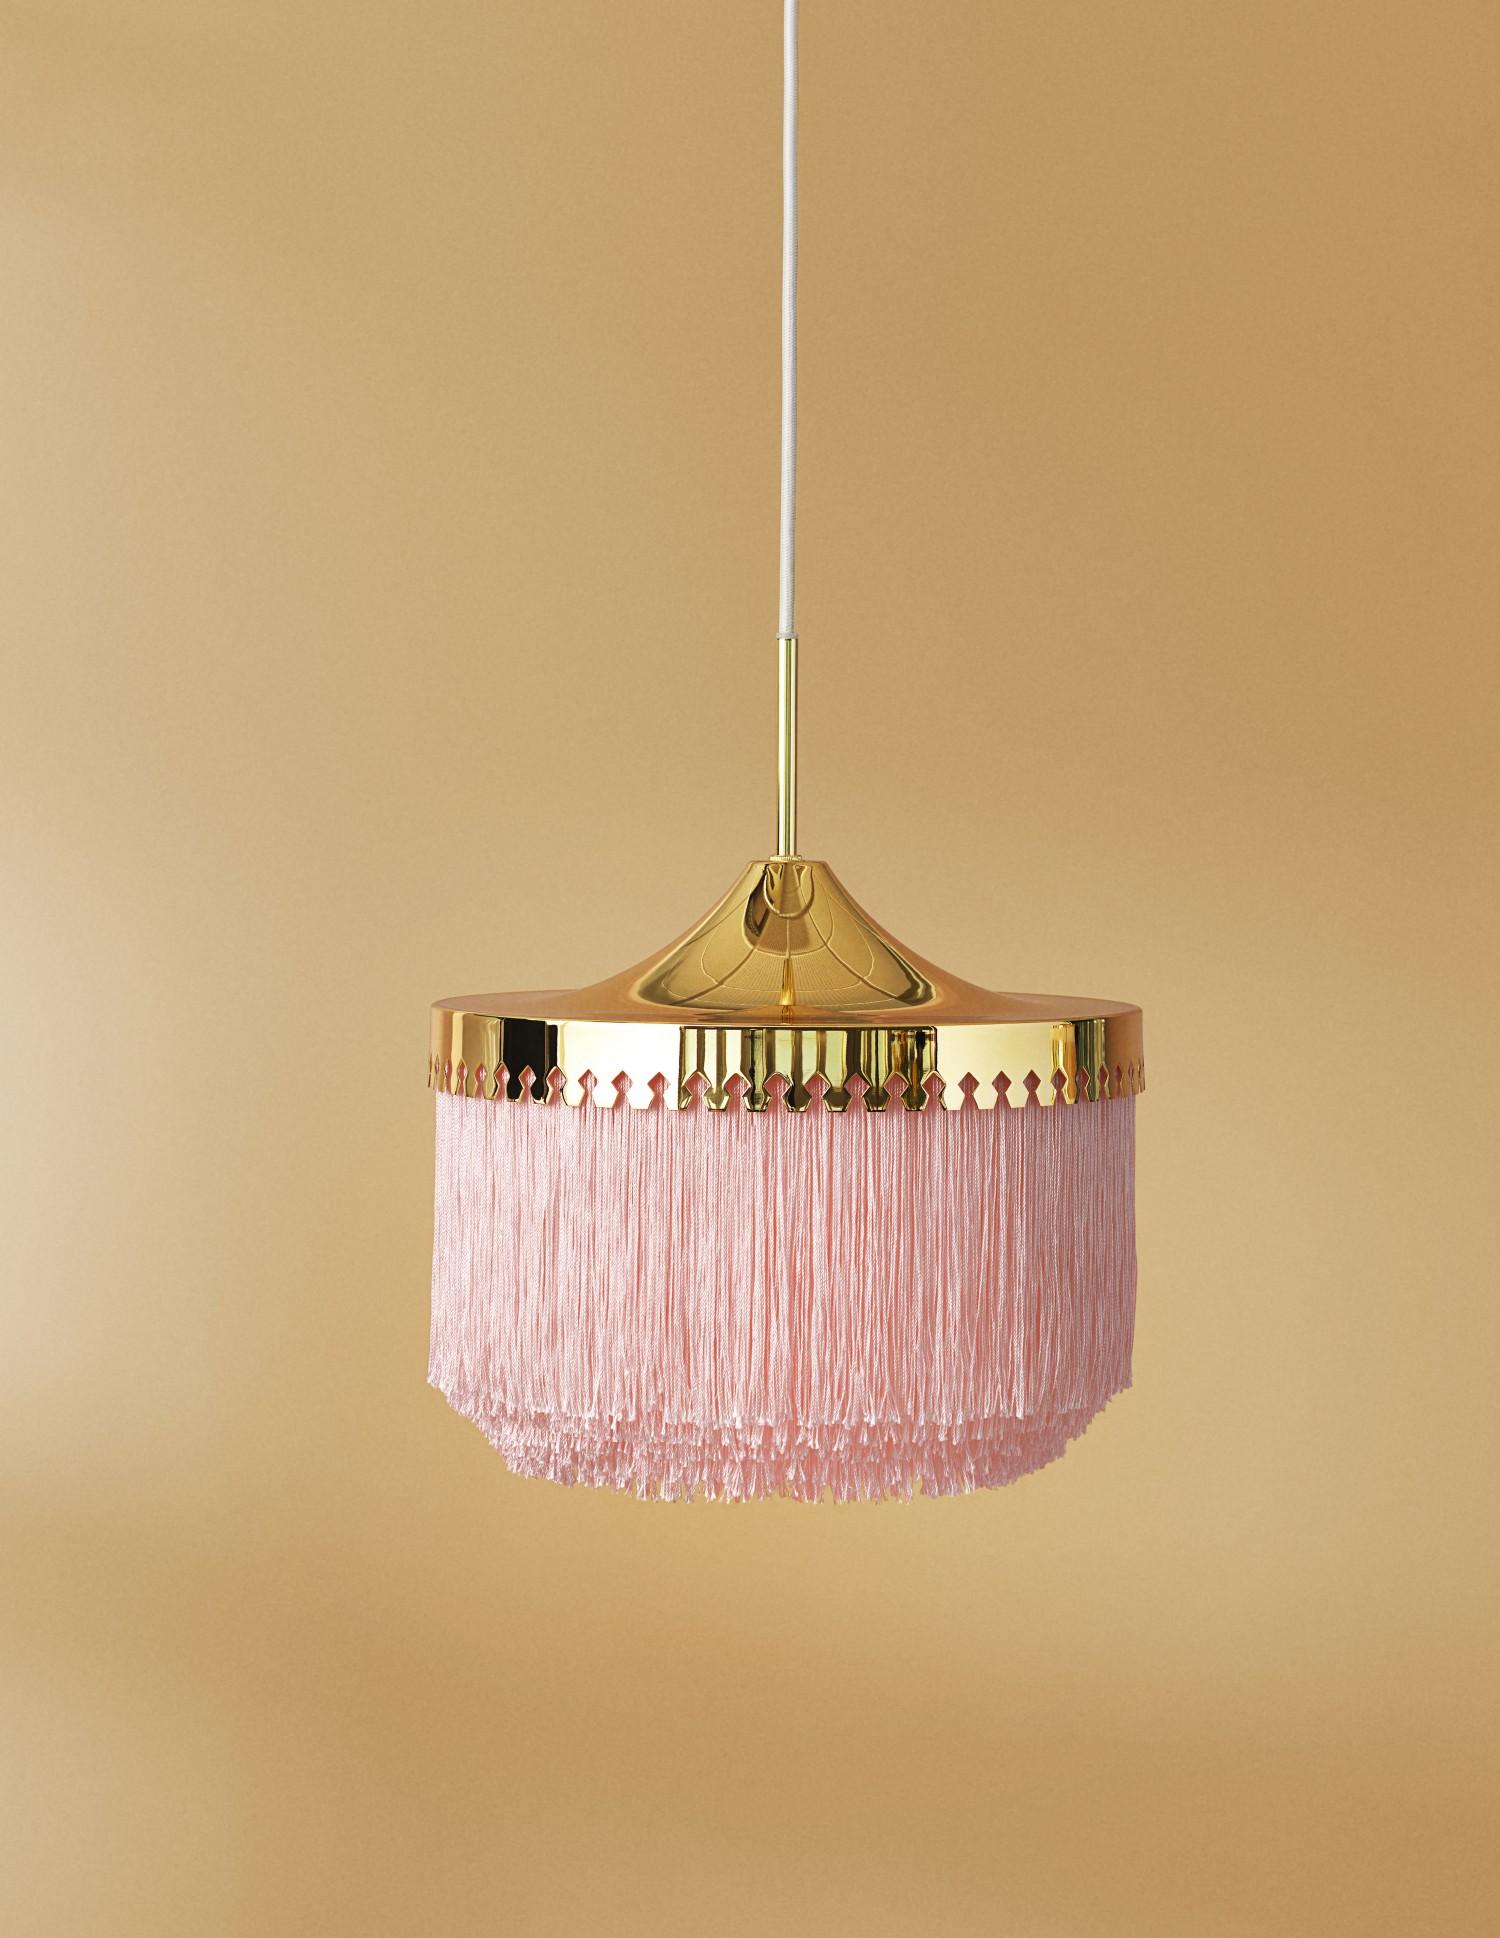 4420003-warmnordic-lighting-fringe-pendant-palepink-30cm-vyellow